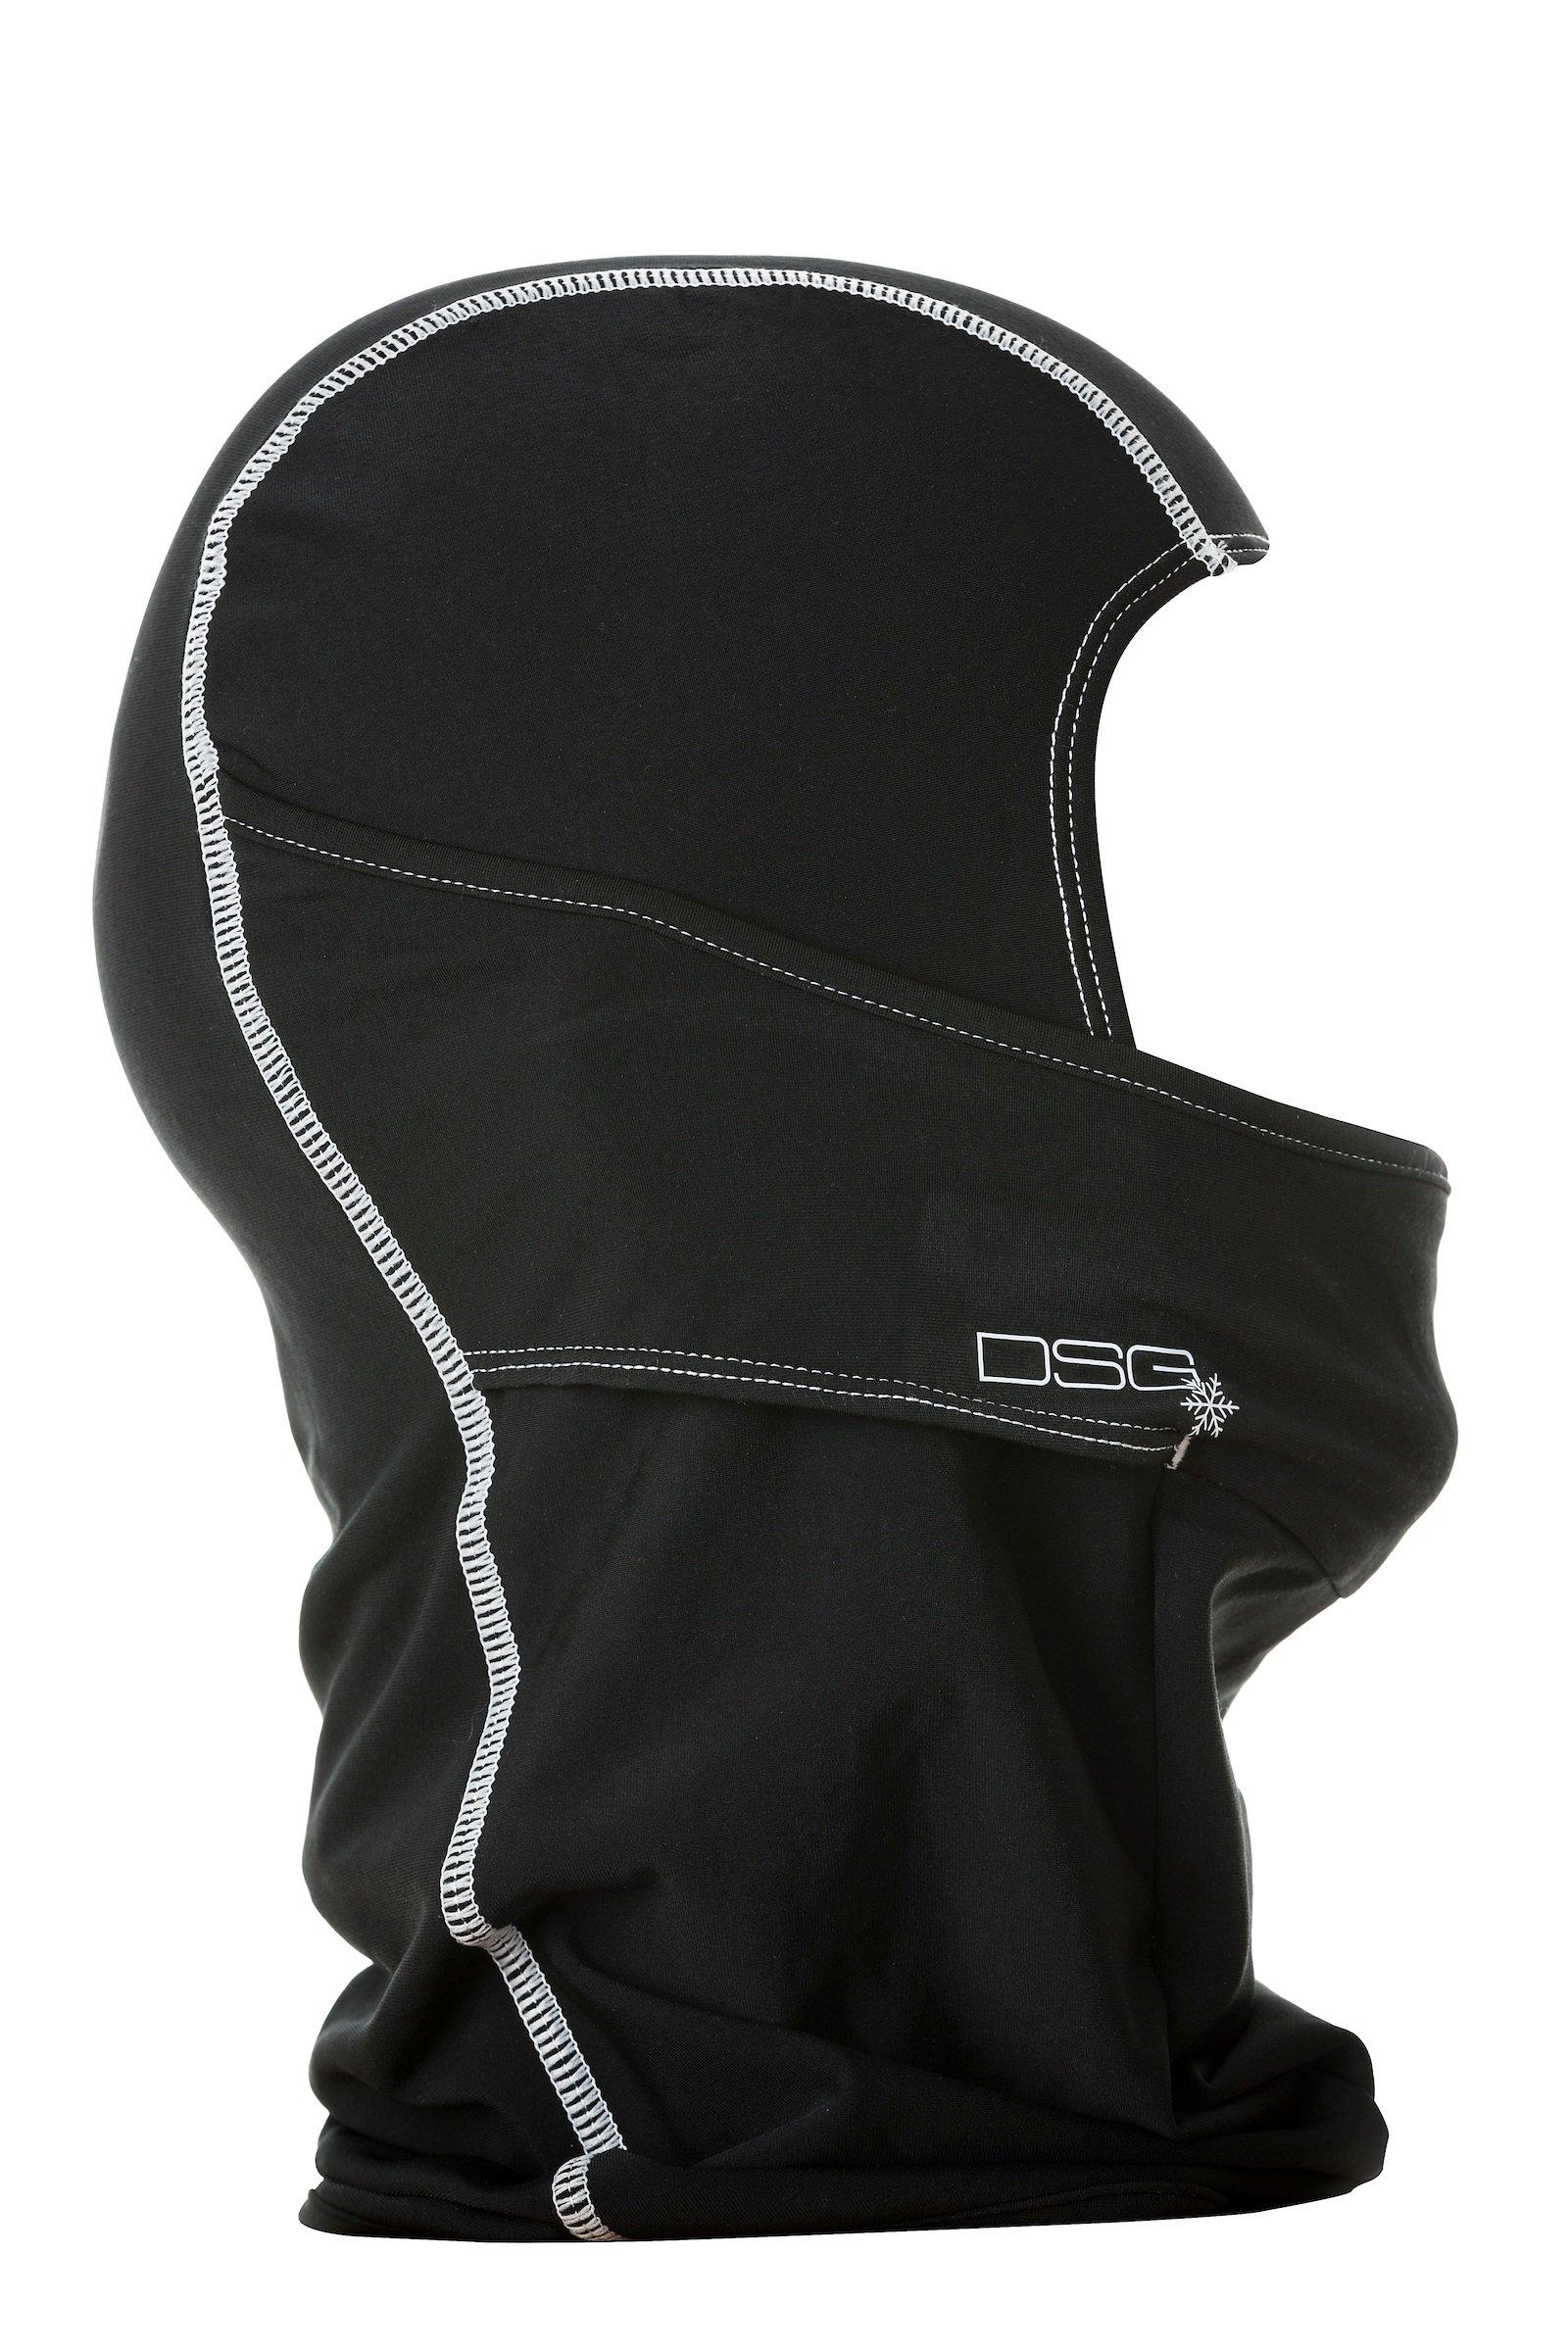 DSG Outerwear Women's Hinged Balaclava - Soft, Hinged Mouth, Moisture Wicking (Black/White)